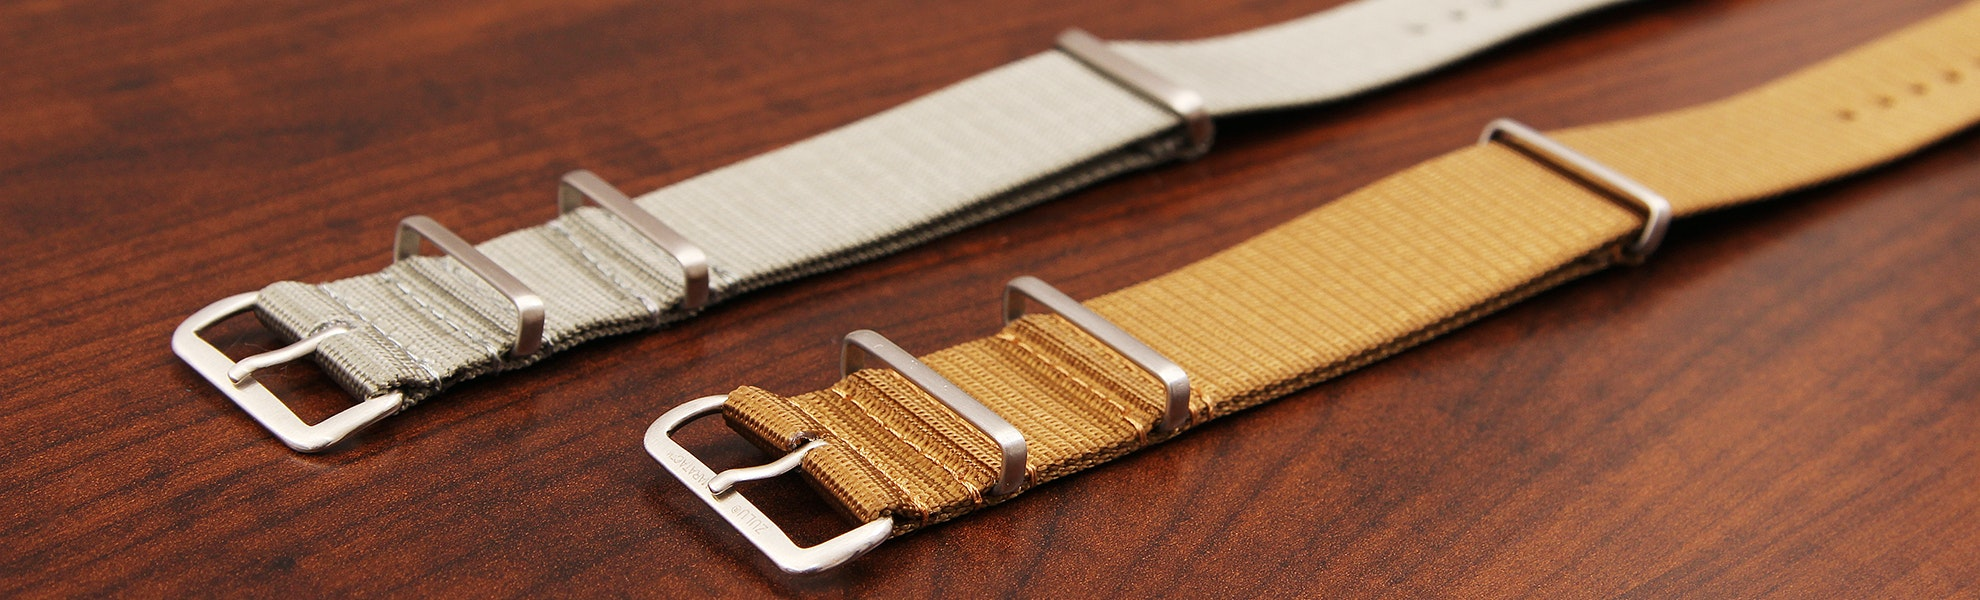 Maratac MIL-NATO Watch Band (2-Pack)